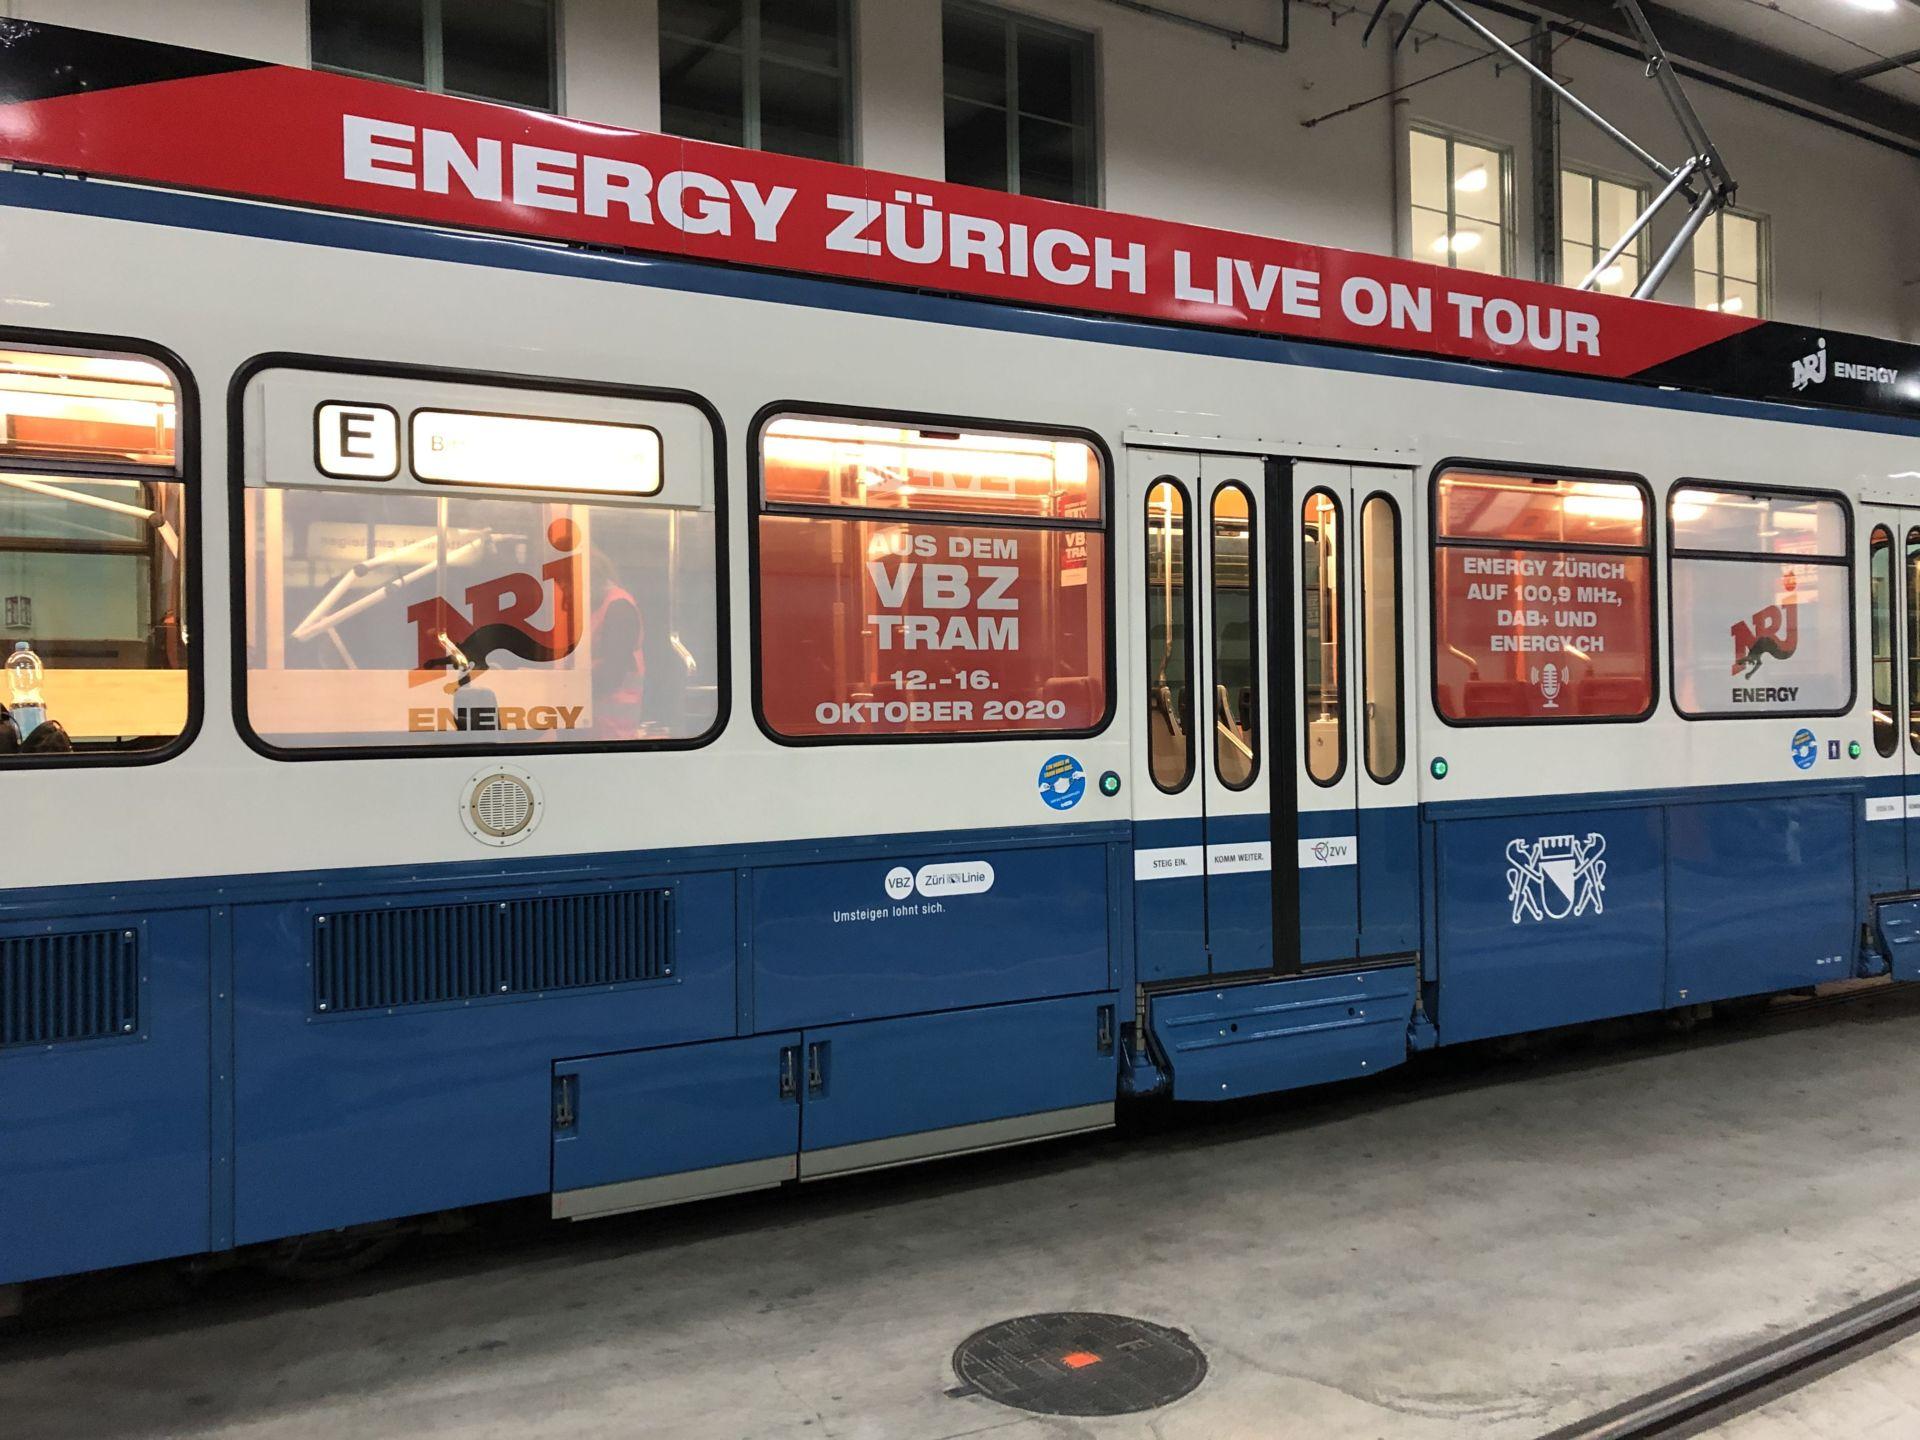 Radio Energy im VBZ Tram